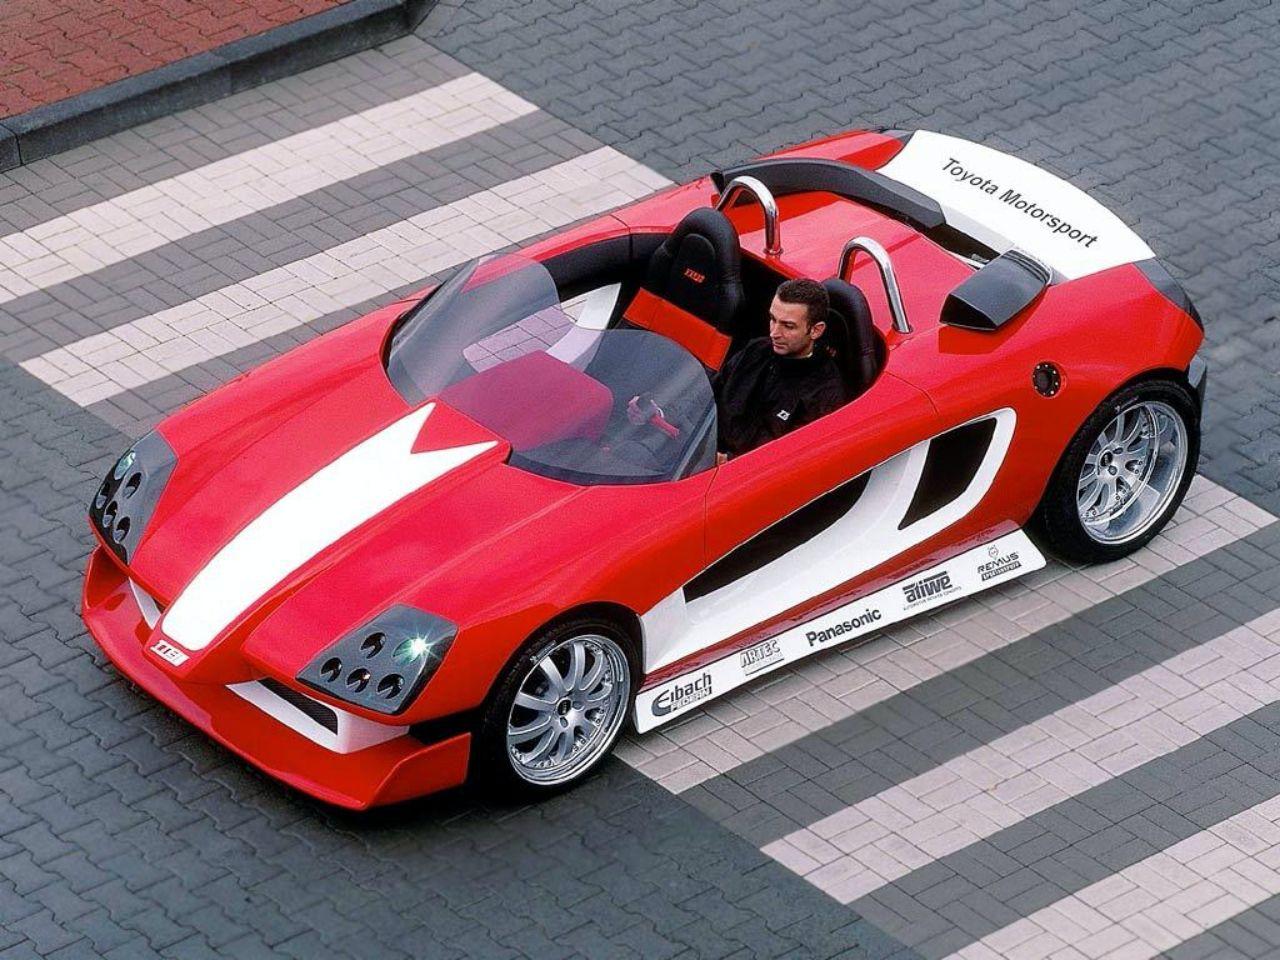 Toyota-MR2-Street-Affair-Concept-3